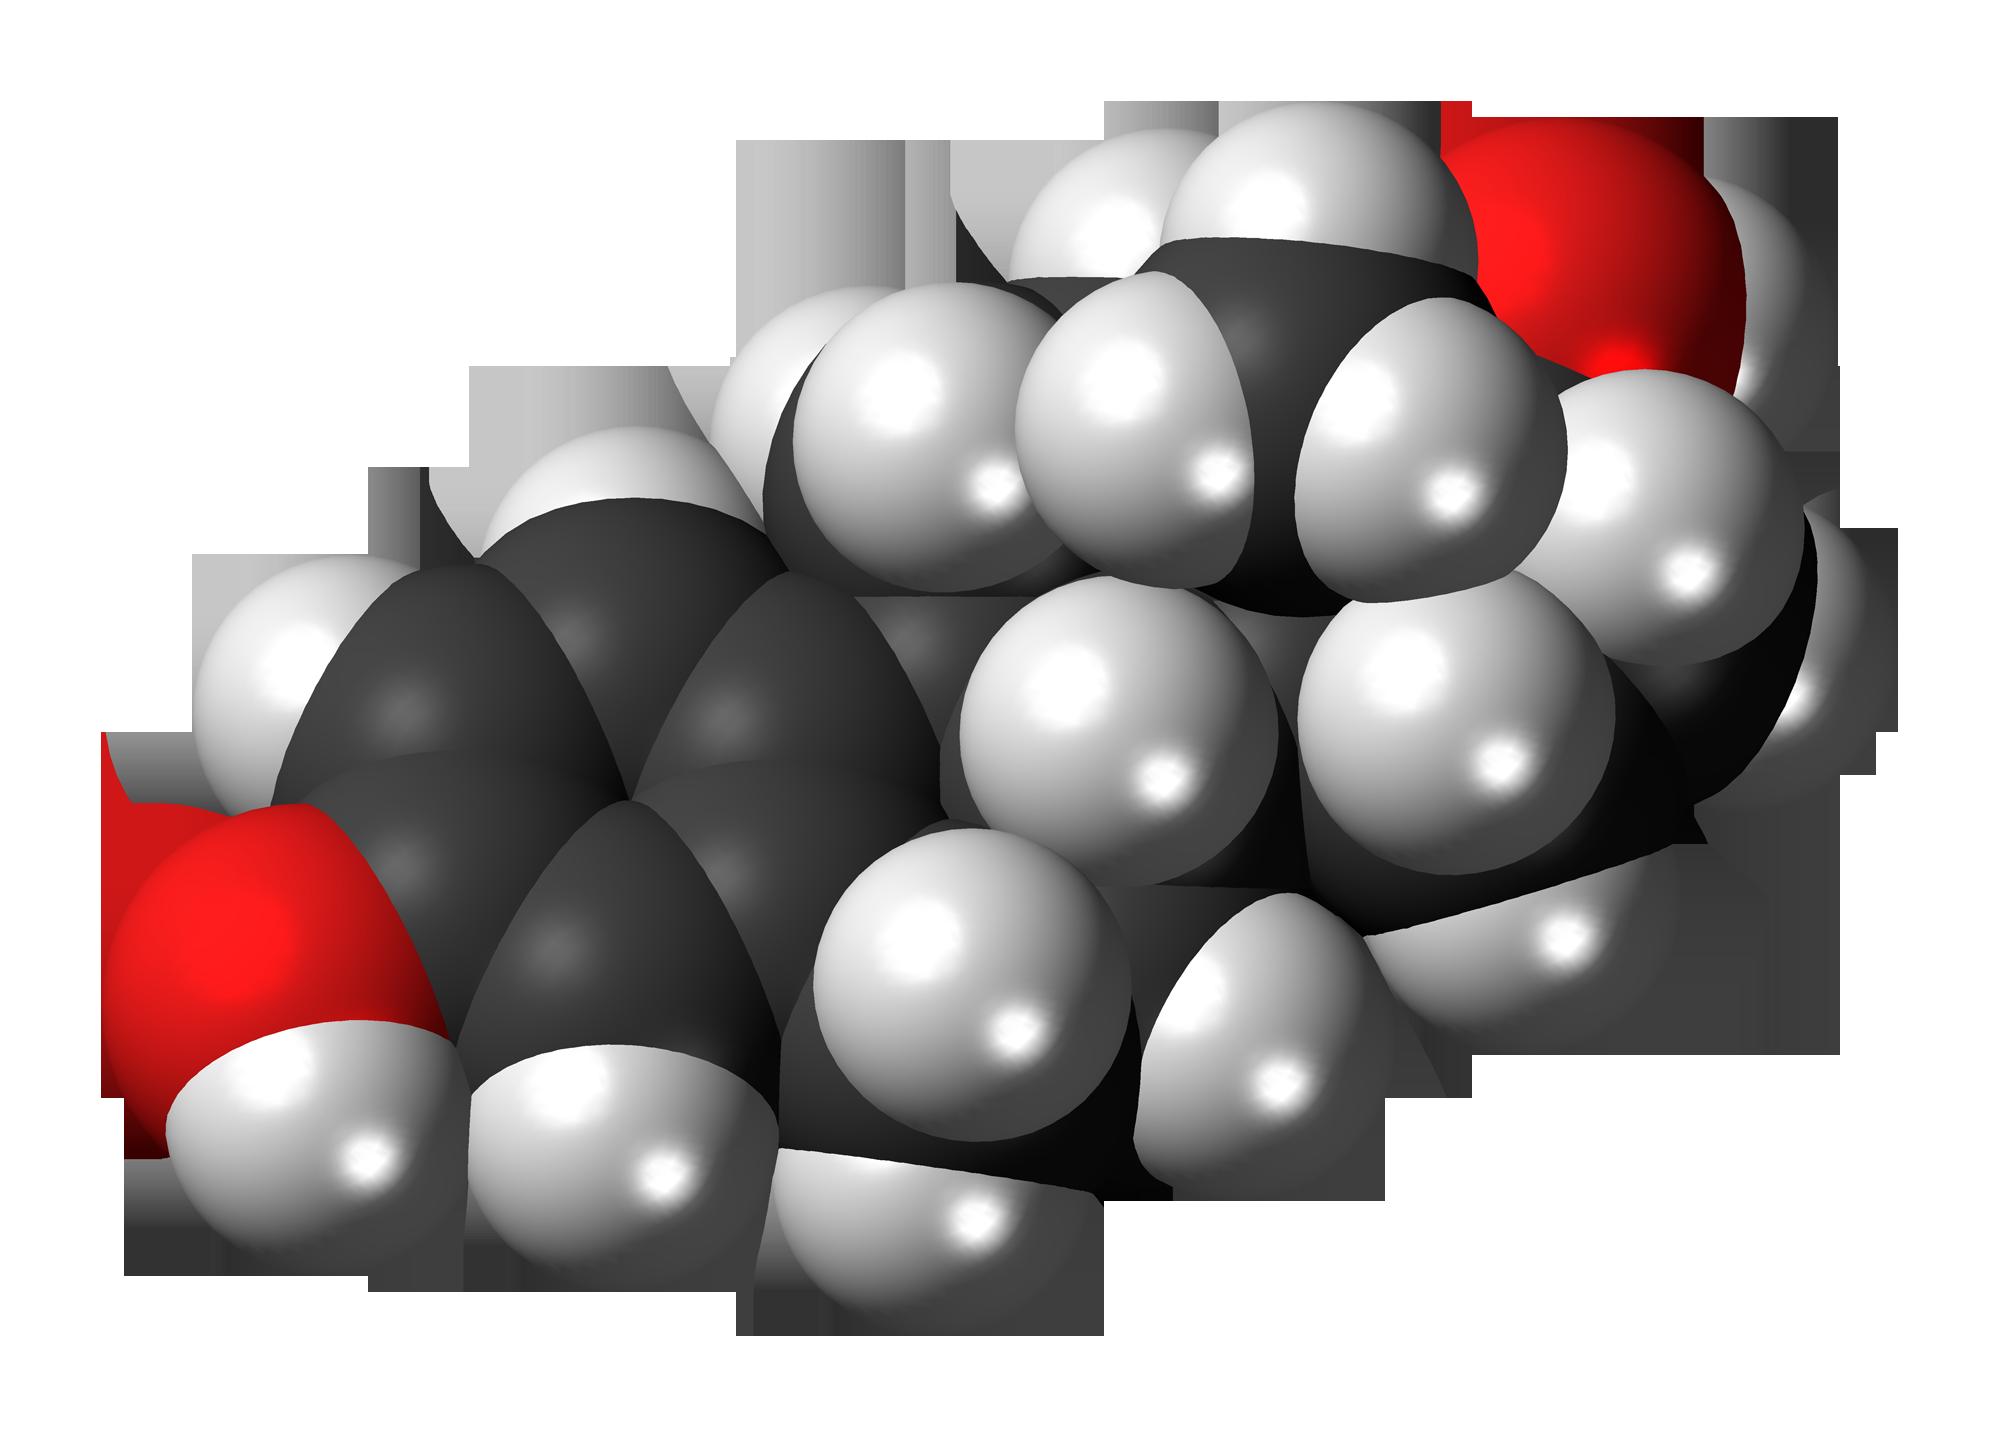 free testosterone wiki